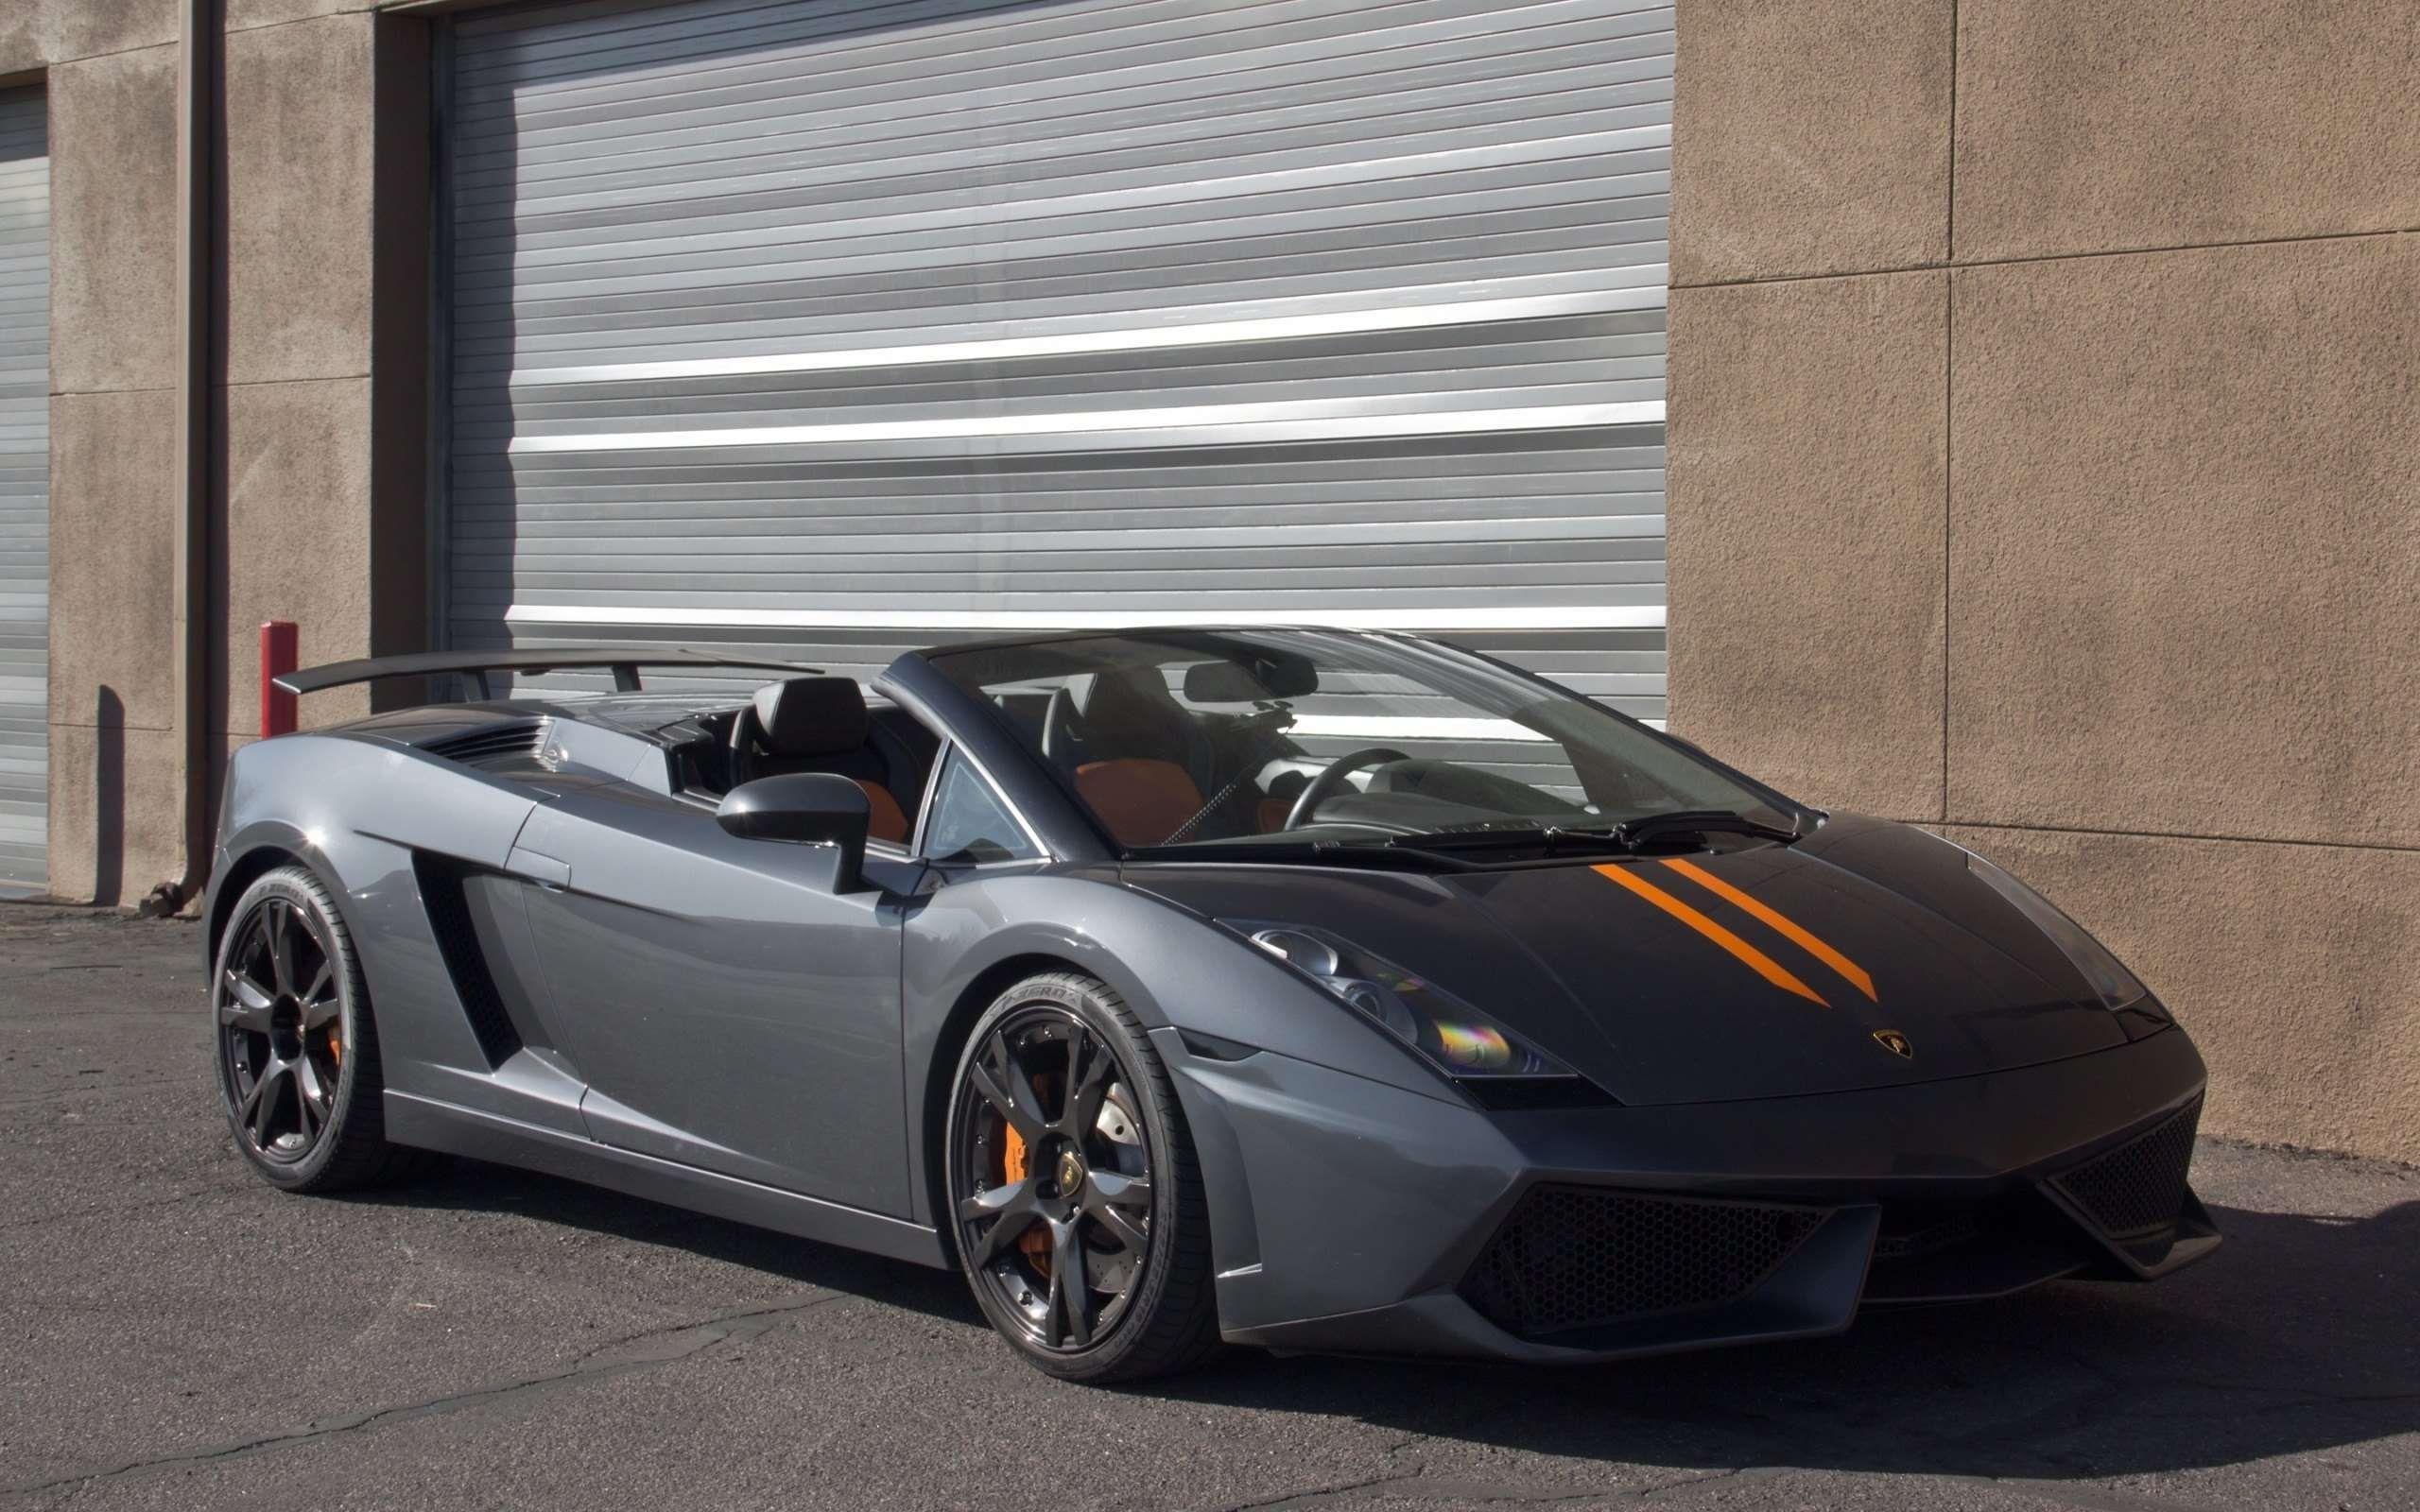 189fcfb8bf7b01efb99c9a9180a3c883 Inspiring Bugatti Veyron Vs Lamborghini Gallardo Cars Trend